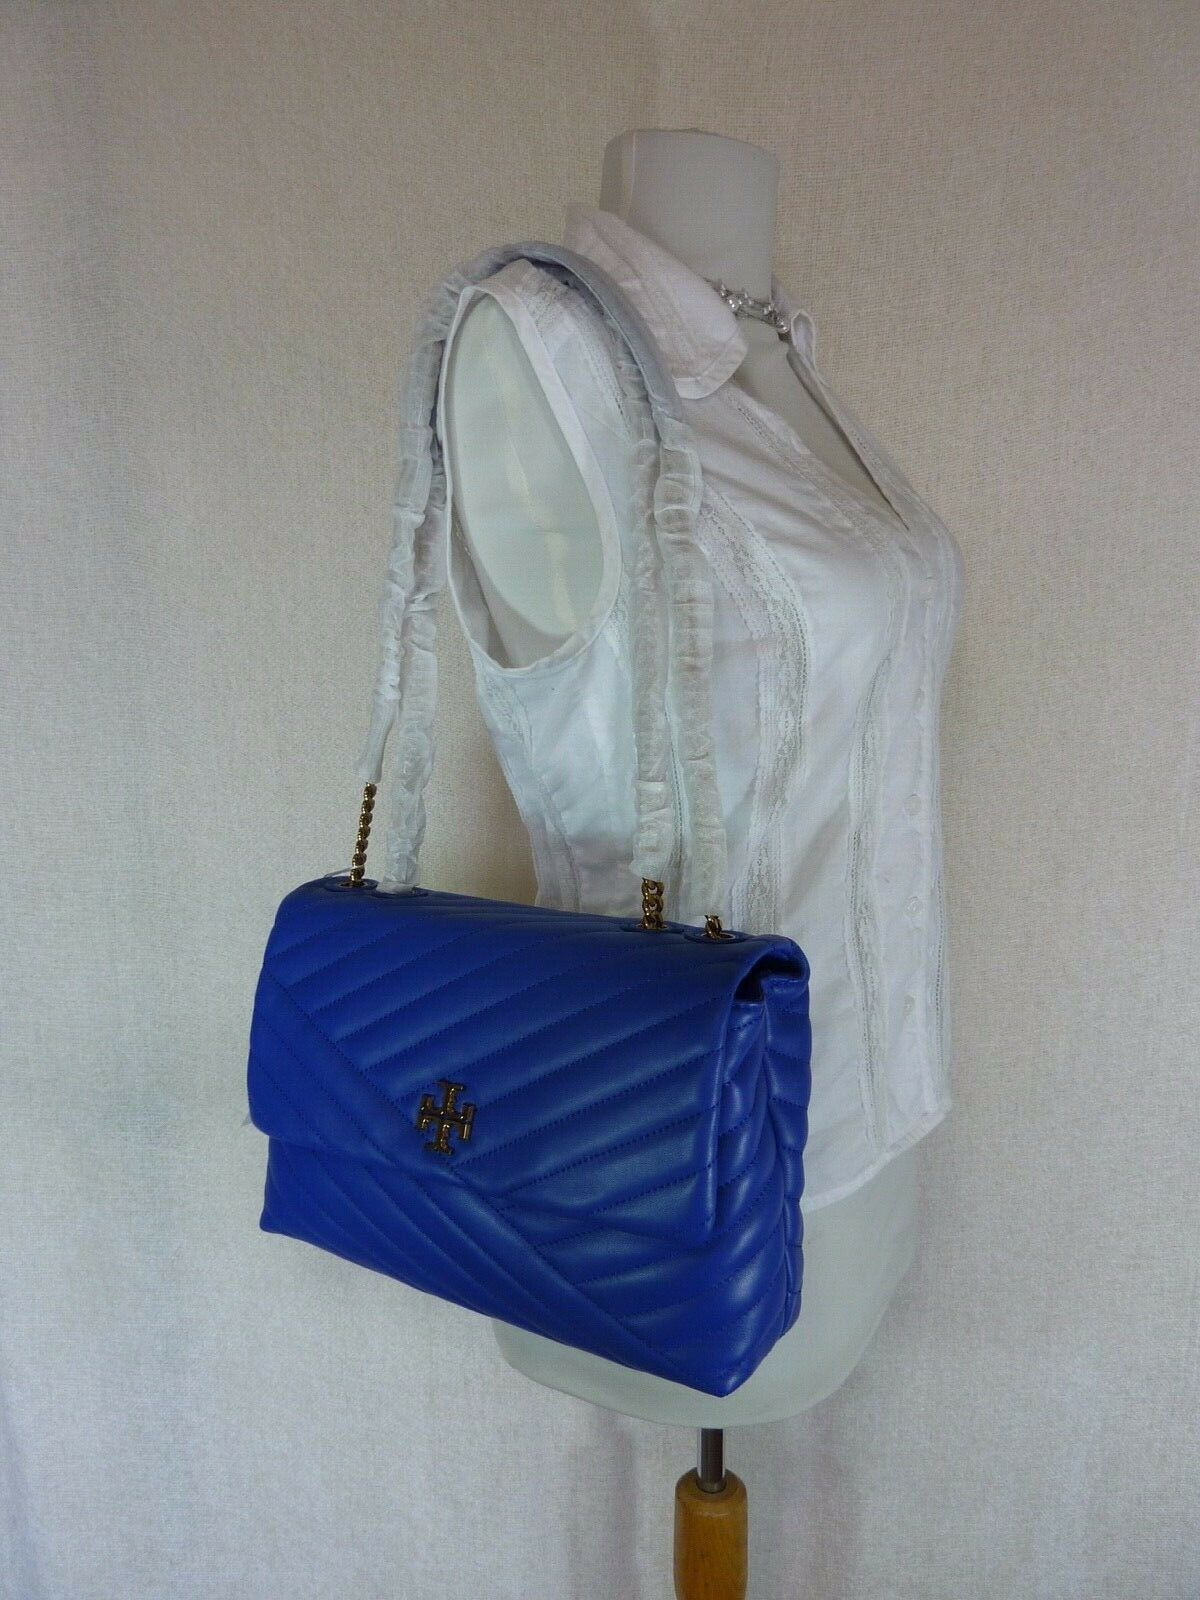 NWT Tory Burch Nautical Blue Kira Chevron Convertible Shoulder Bag image 2